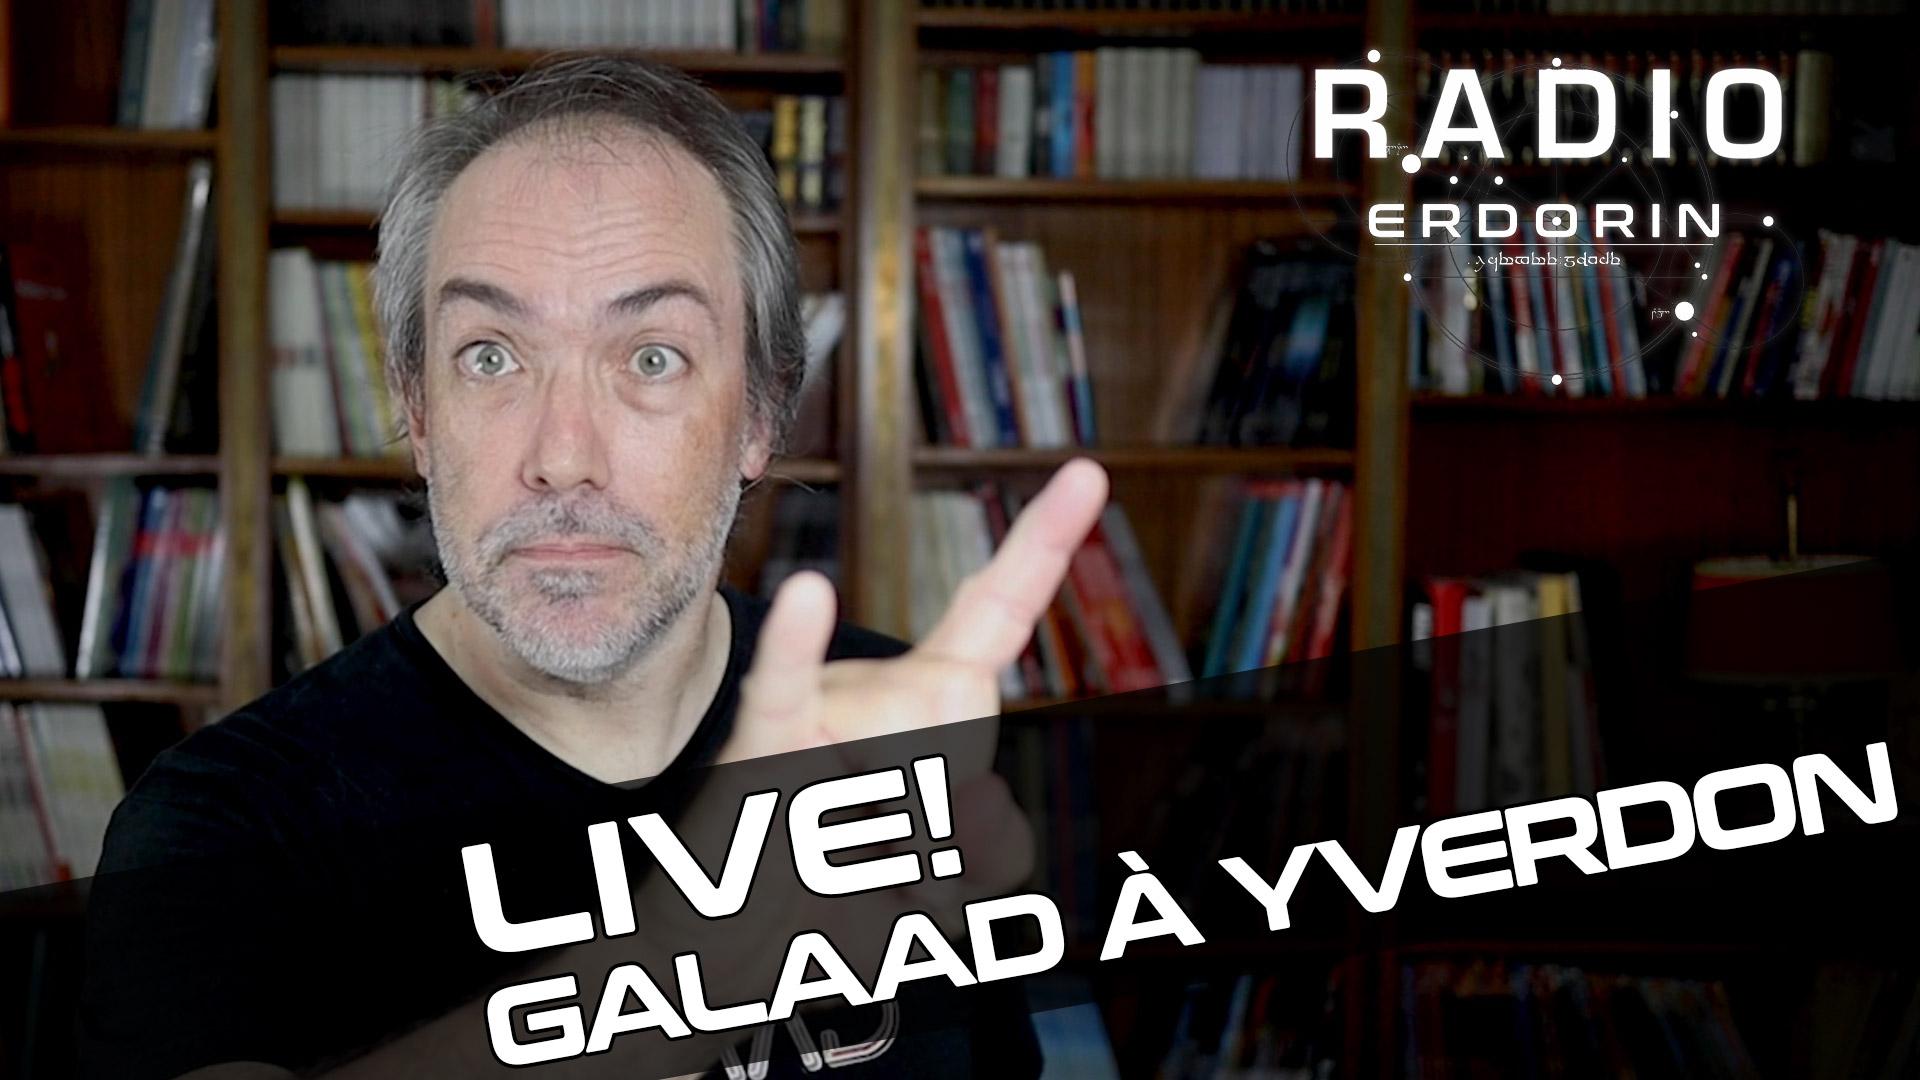 Radio-Erdorin Live S3E1 - Galaad à Yverdon